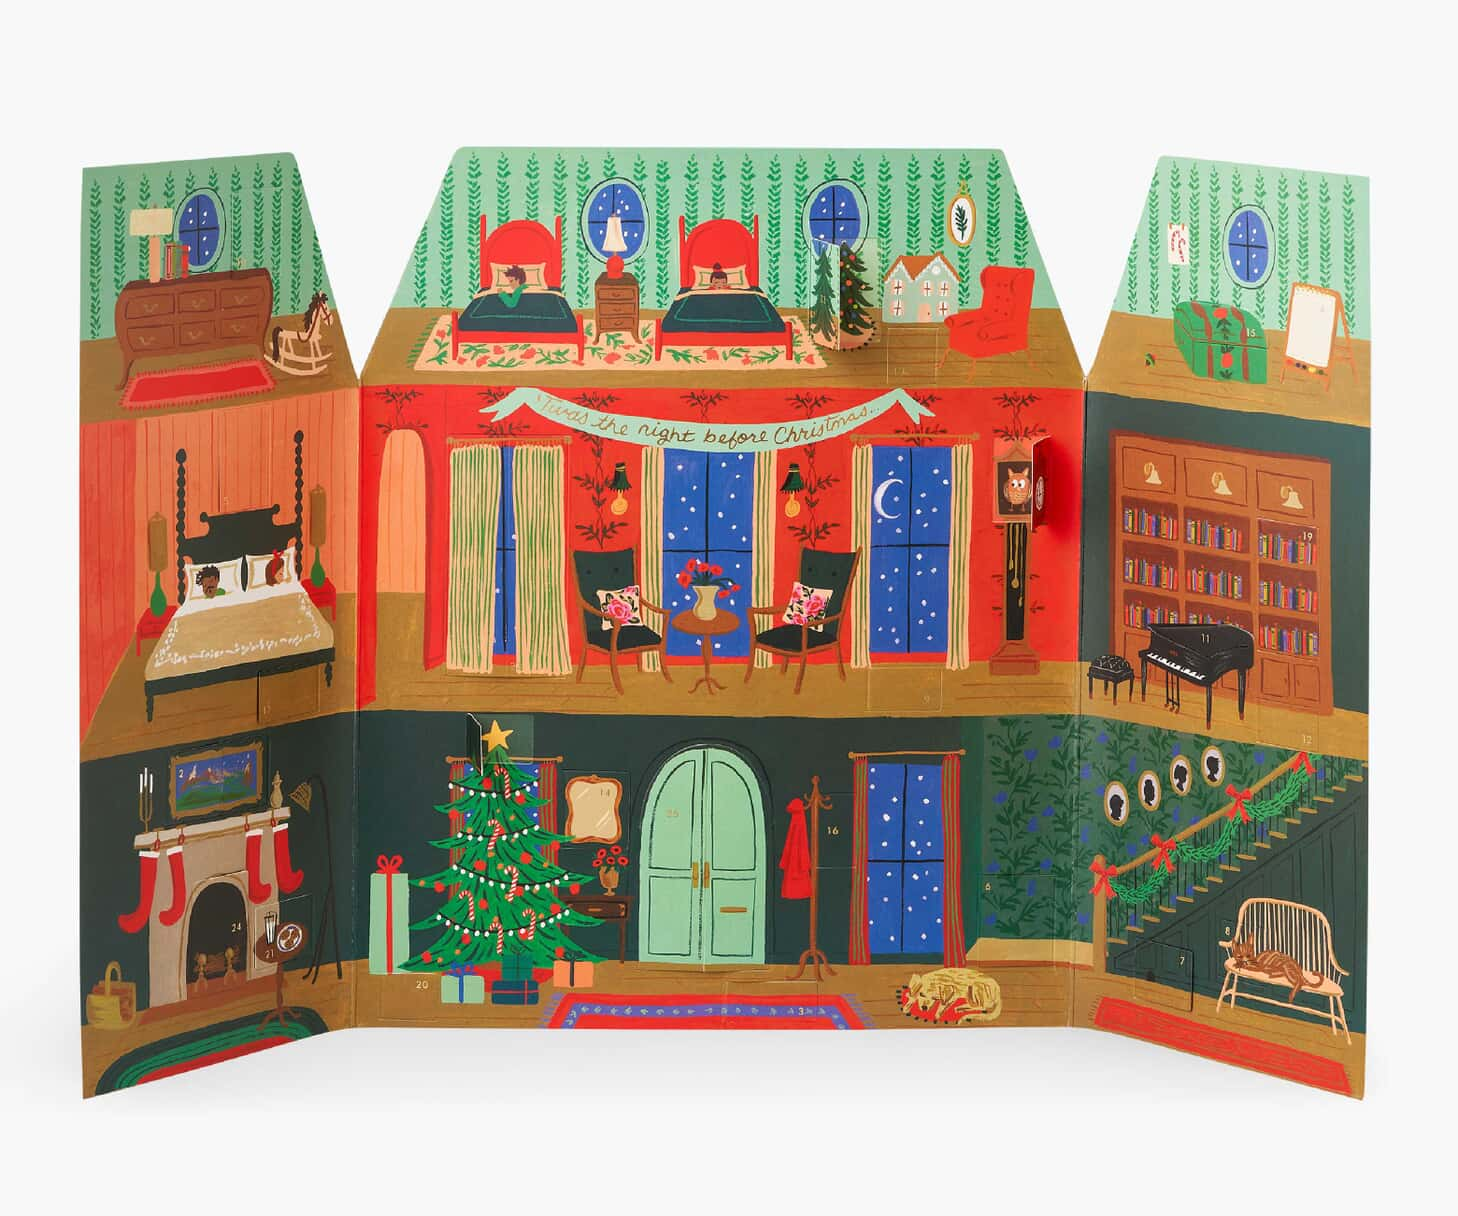 advent-calendar-paper-hygge-cozy-2020-christmas